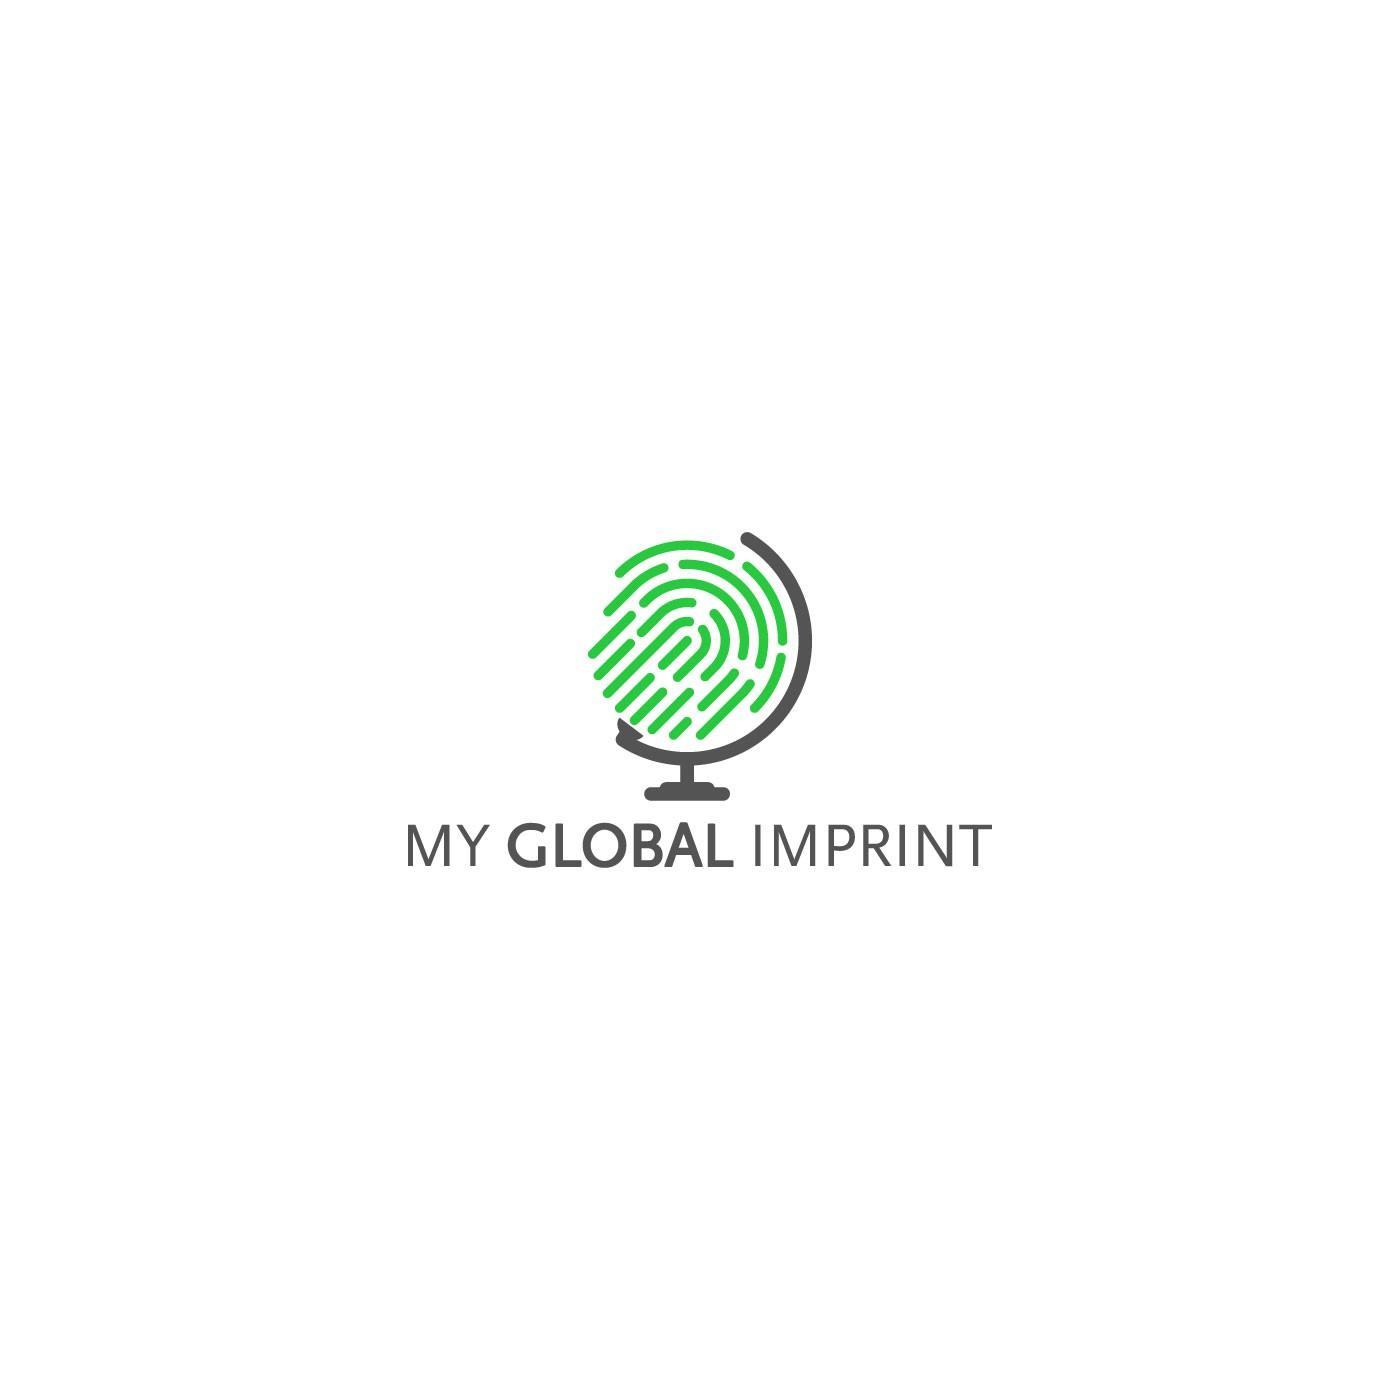 Create a capturing, memorable illustration for 'My Global Imprint'